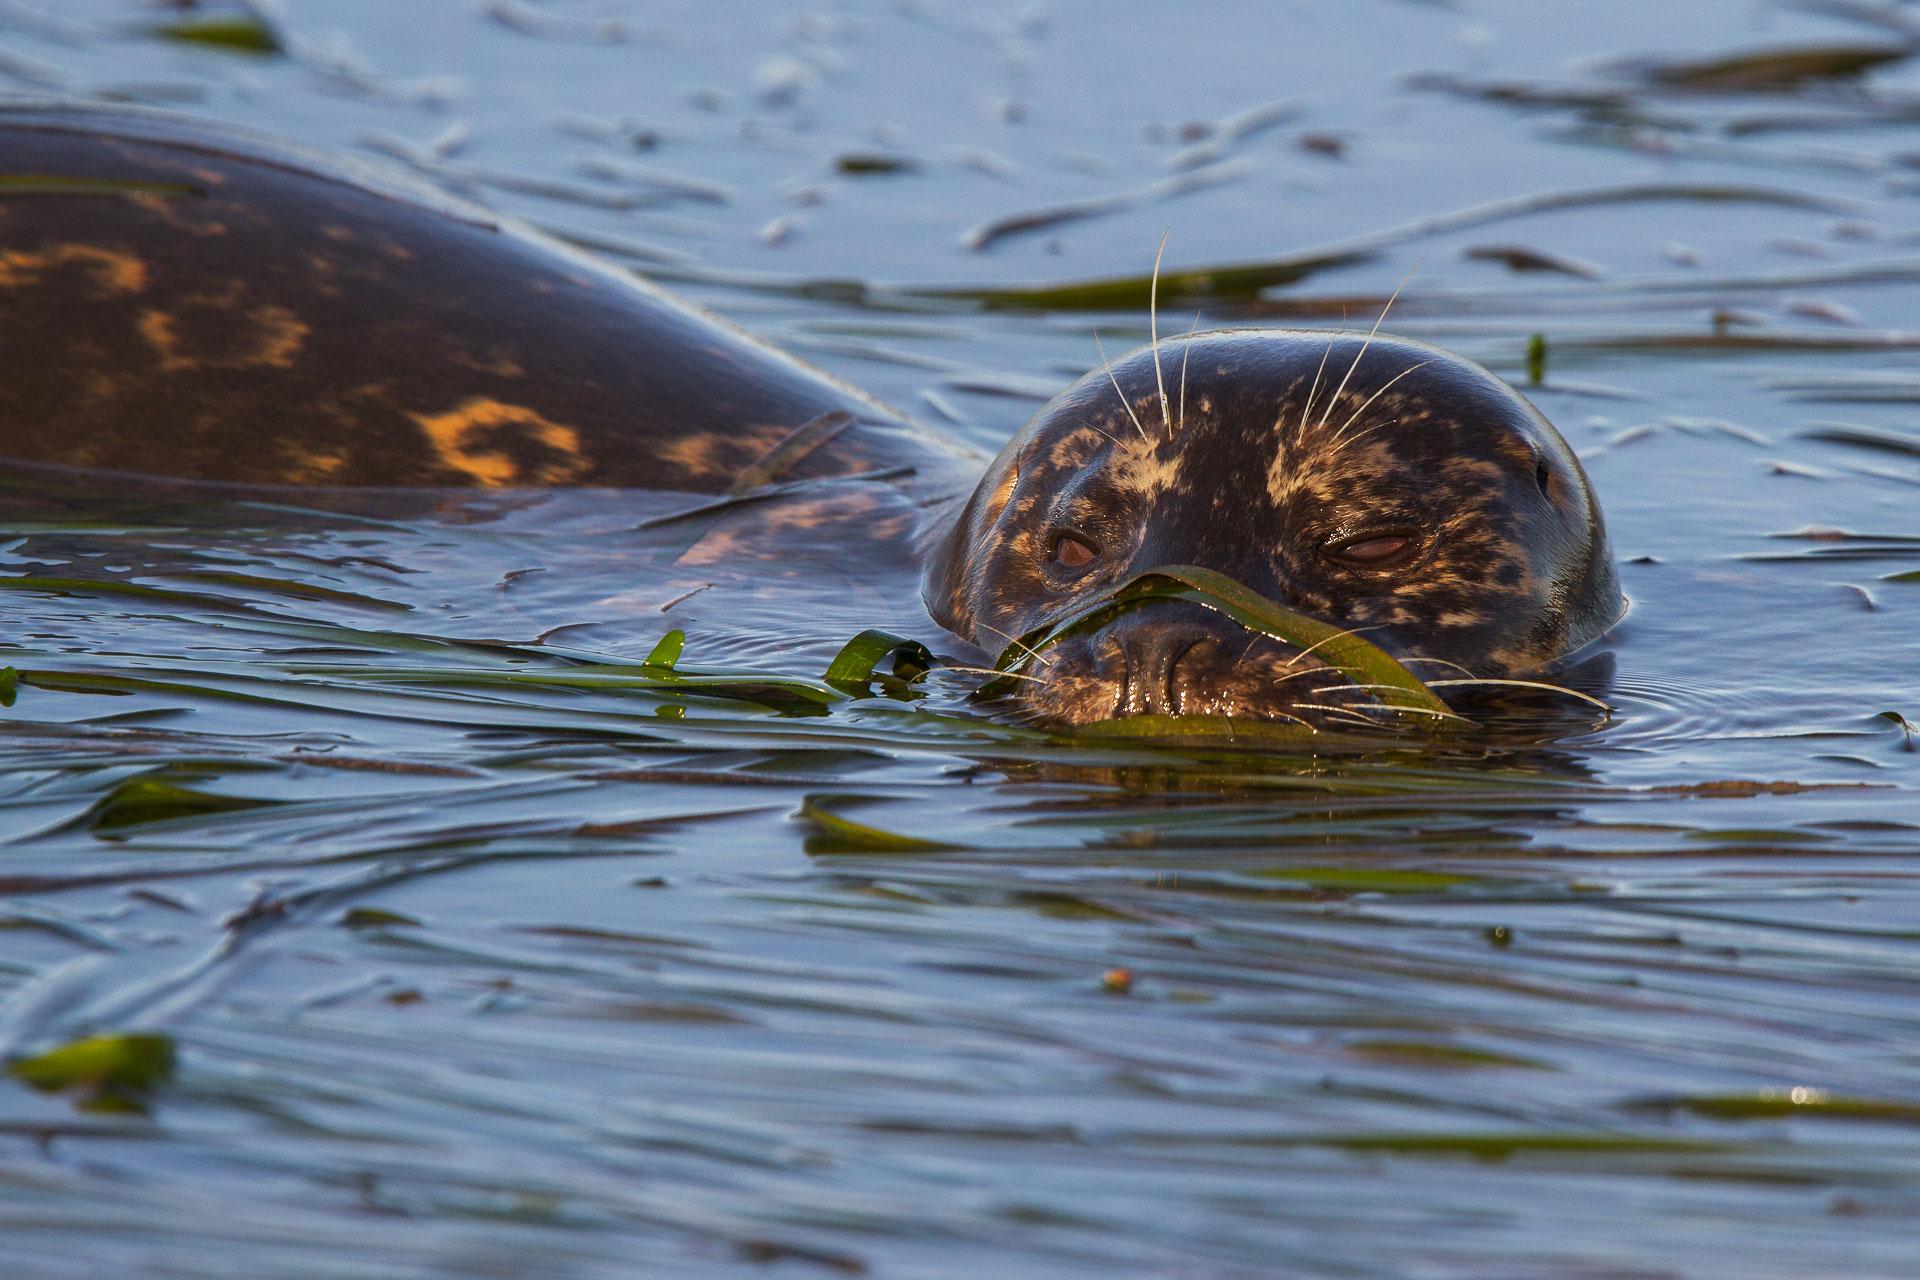 Harbor Seal  (Phoca vitulina) : Elkhorn Slough, California  Canon 7D + Canon 300mm f2.8L IS w/ Canon 1.4x Converter